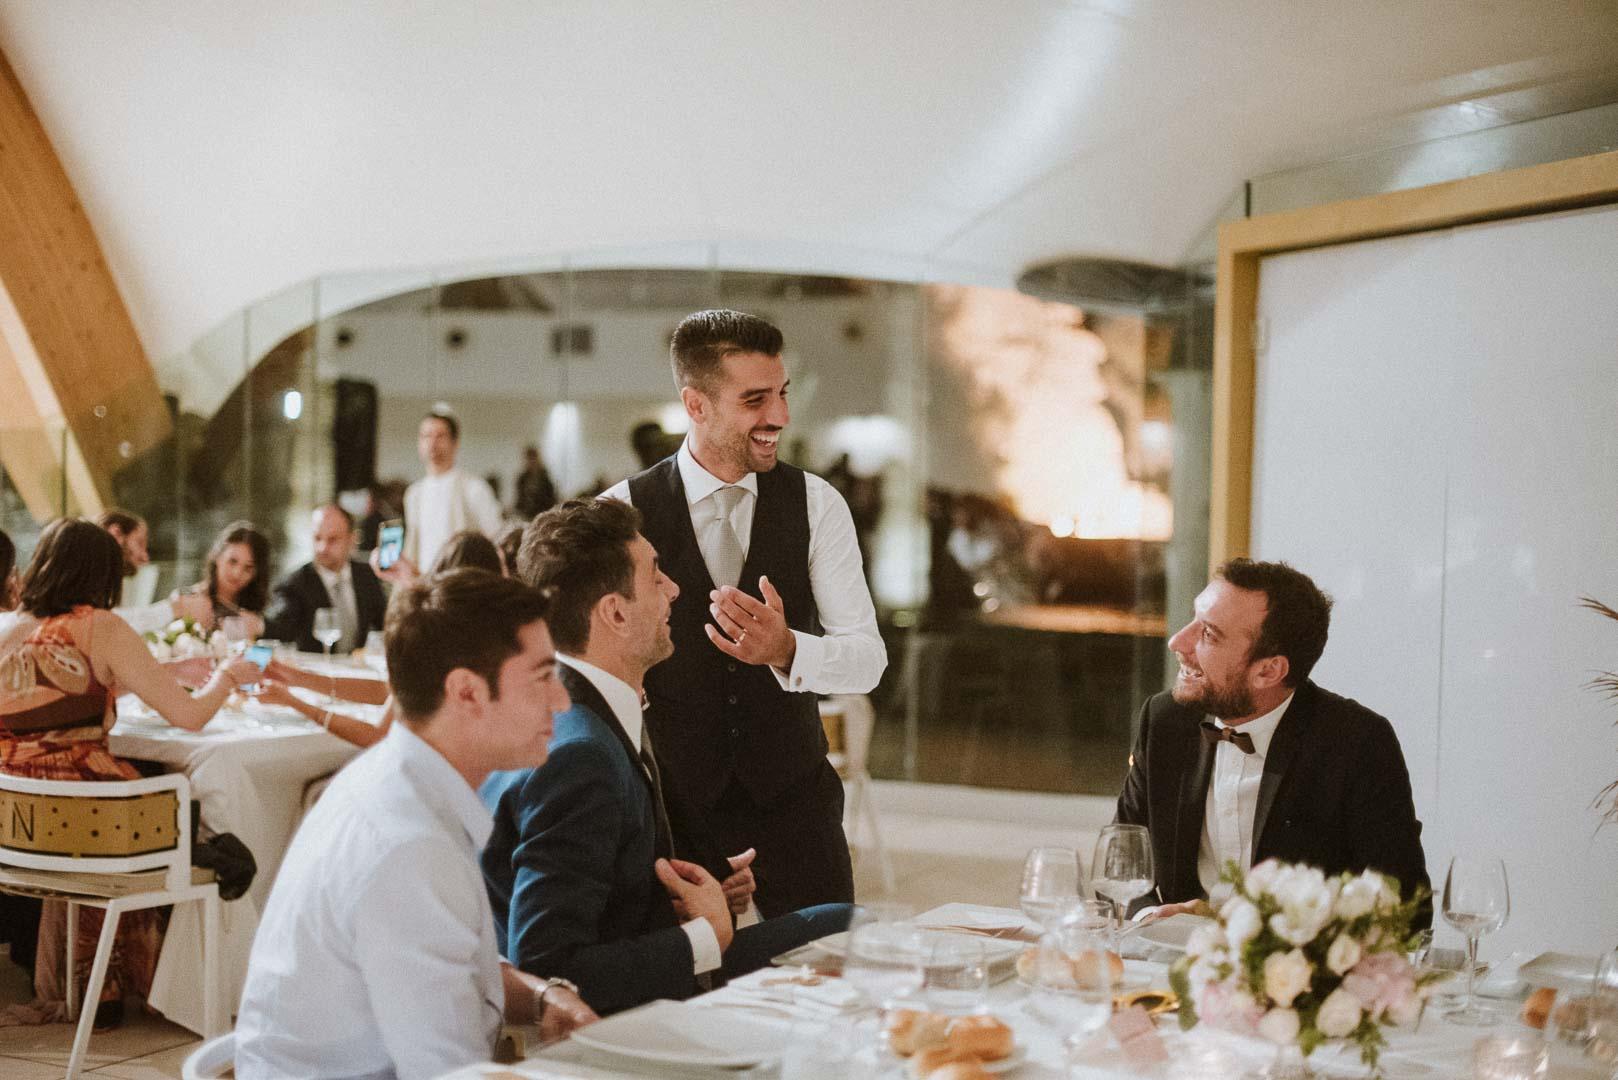 wedding-photographer-destination-fineart-bespoke-reportage-napoli-nabilah-vivianeizzo-spazio46-176